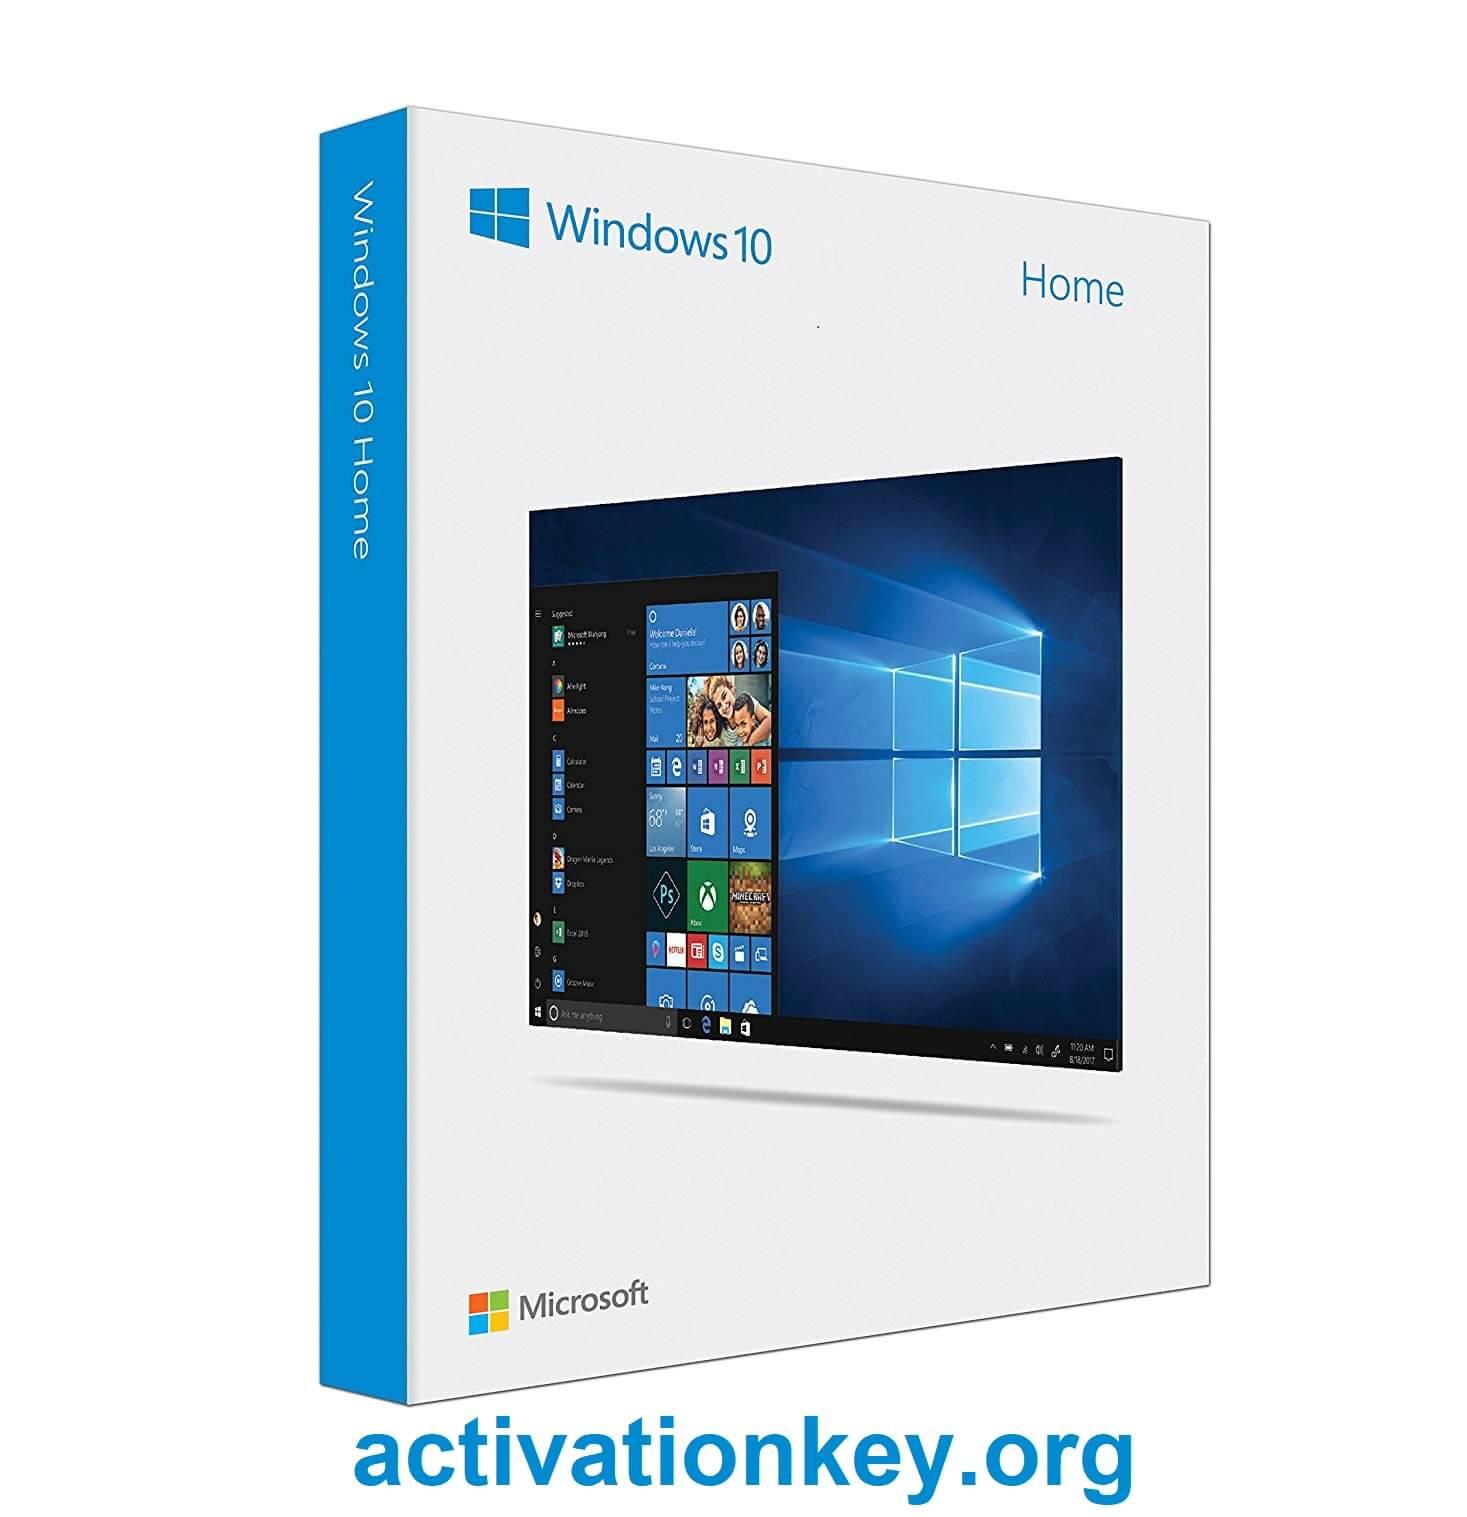 Windows 10 Home Product Key Full Working 32/64bit [2020]